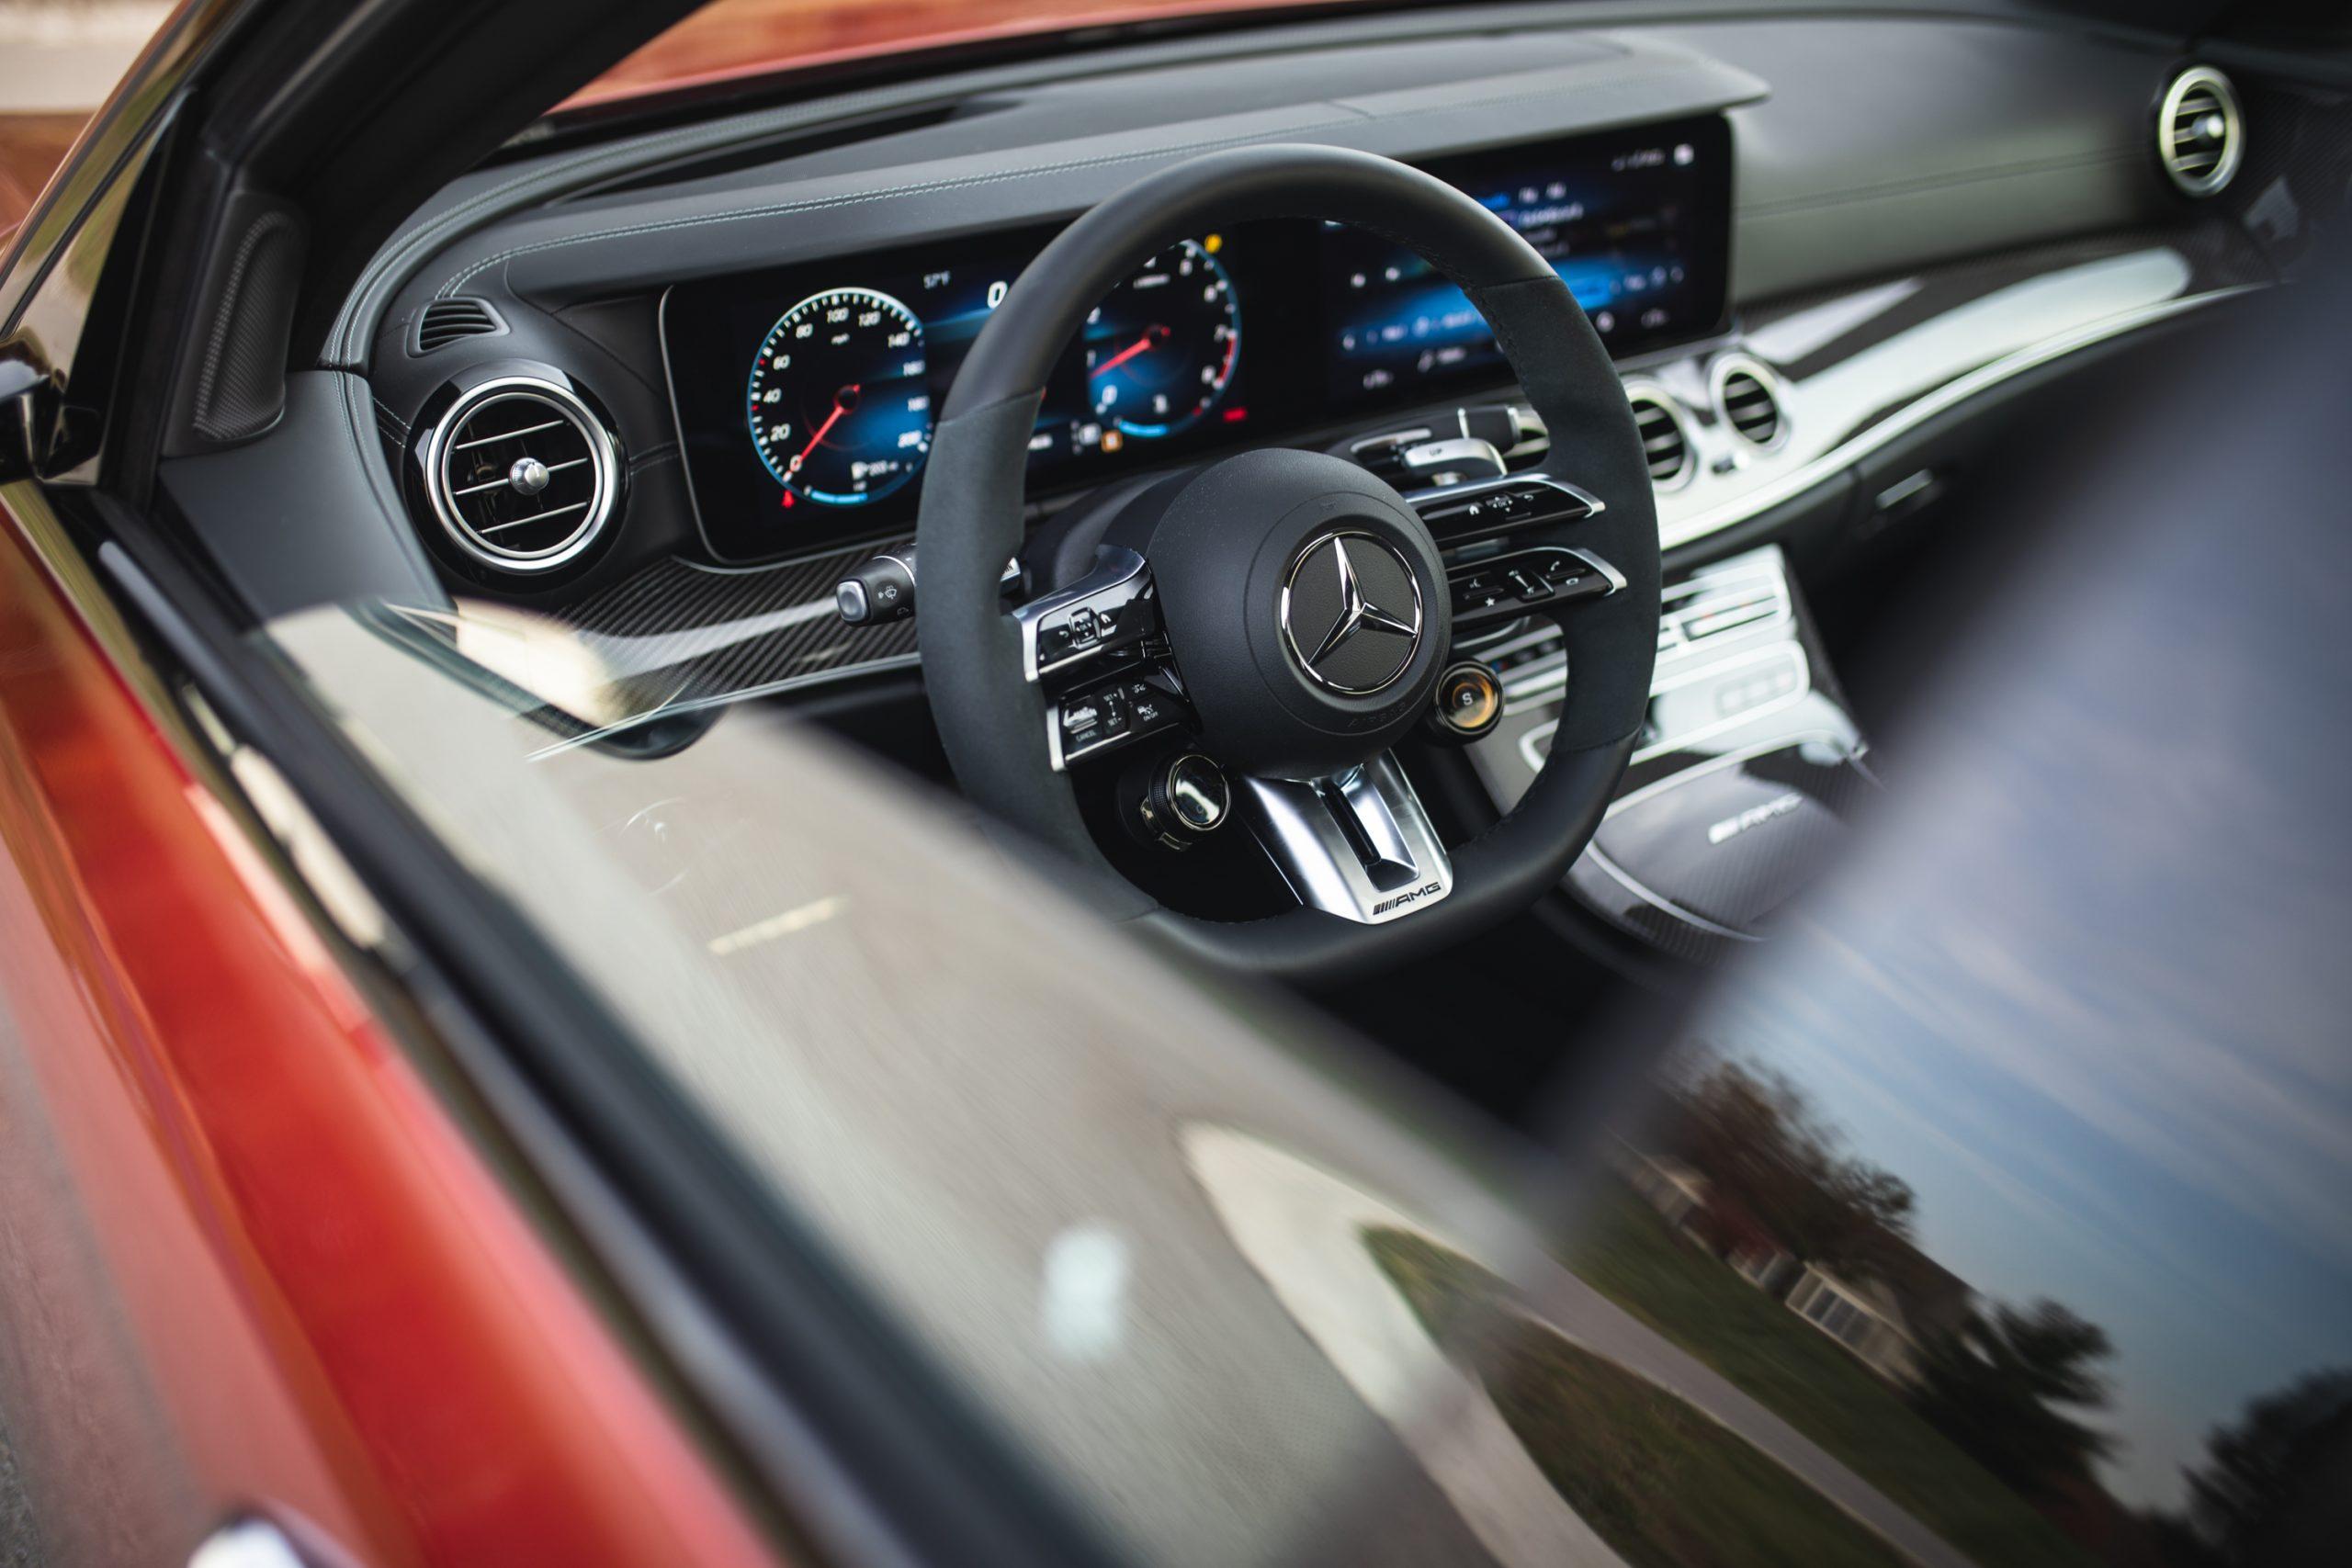 2021 Mercedes-AMG E63 S interior steering wheel through window